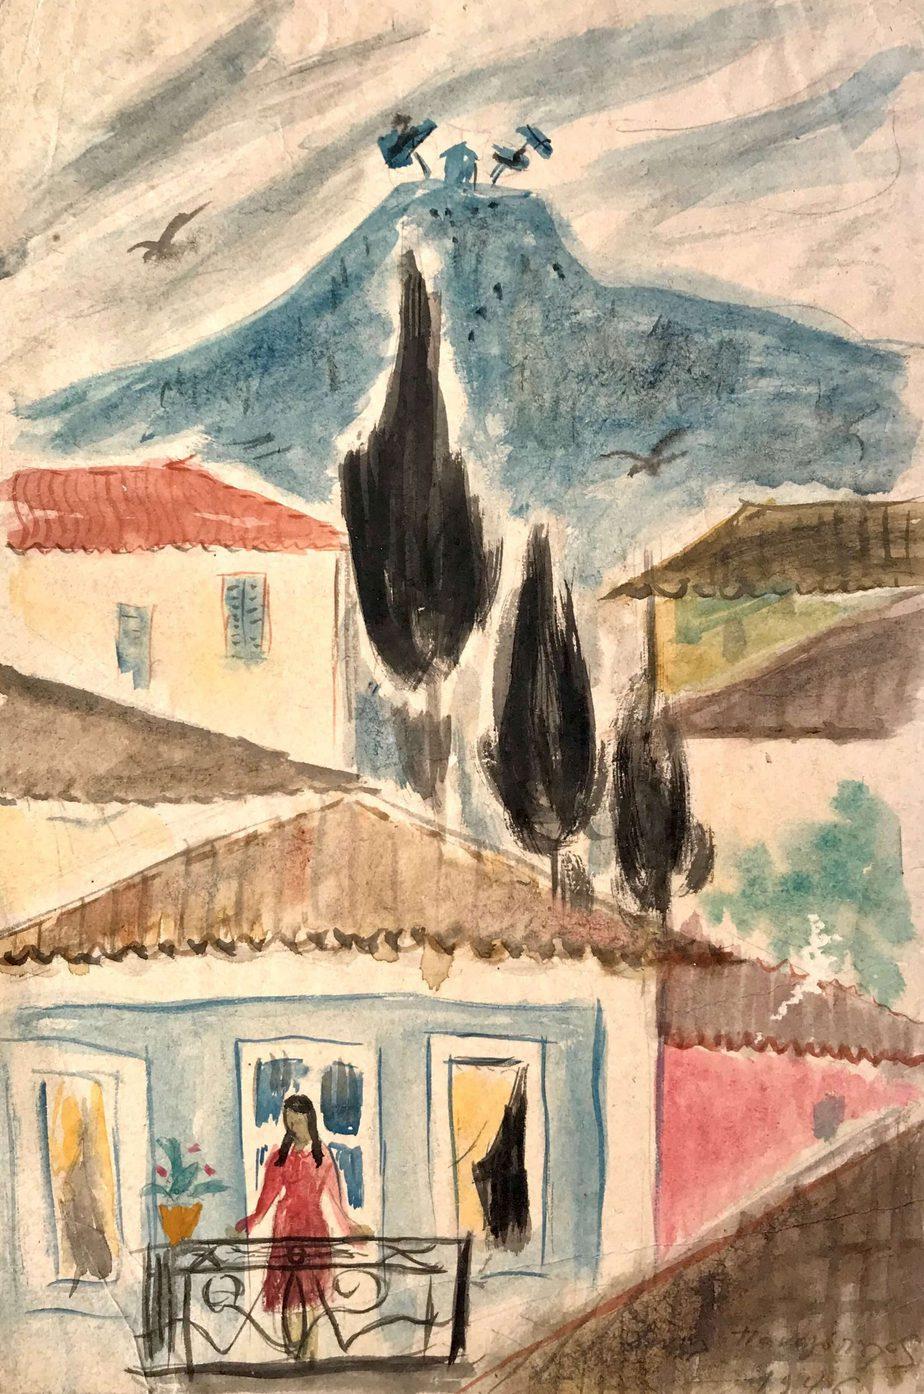 Danil (Panagopoulos) (1924-2008) Watercolor on paper, 1946 34 x 23 cm